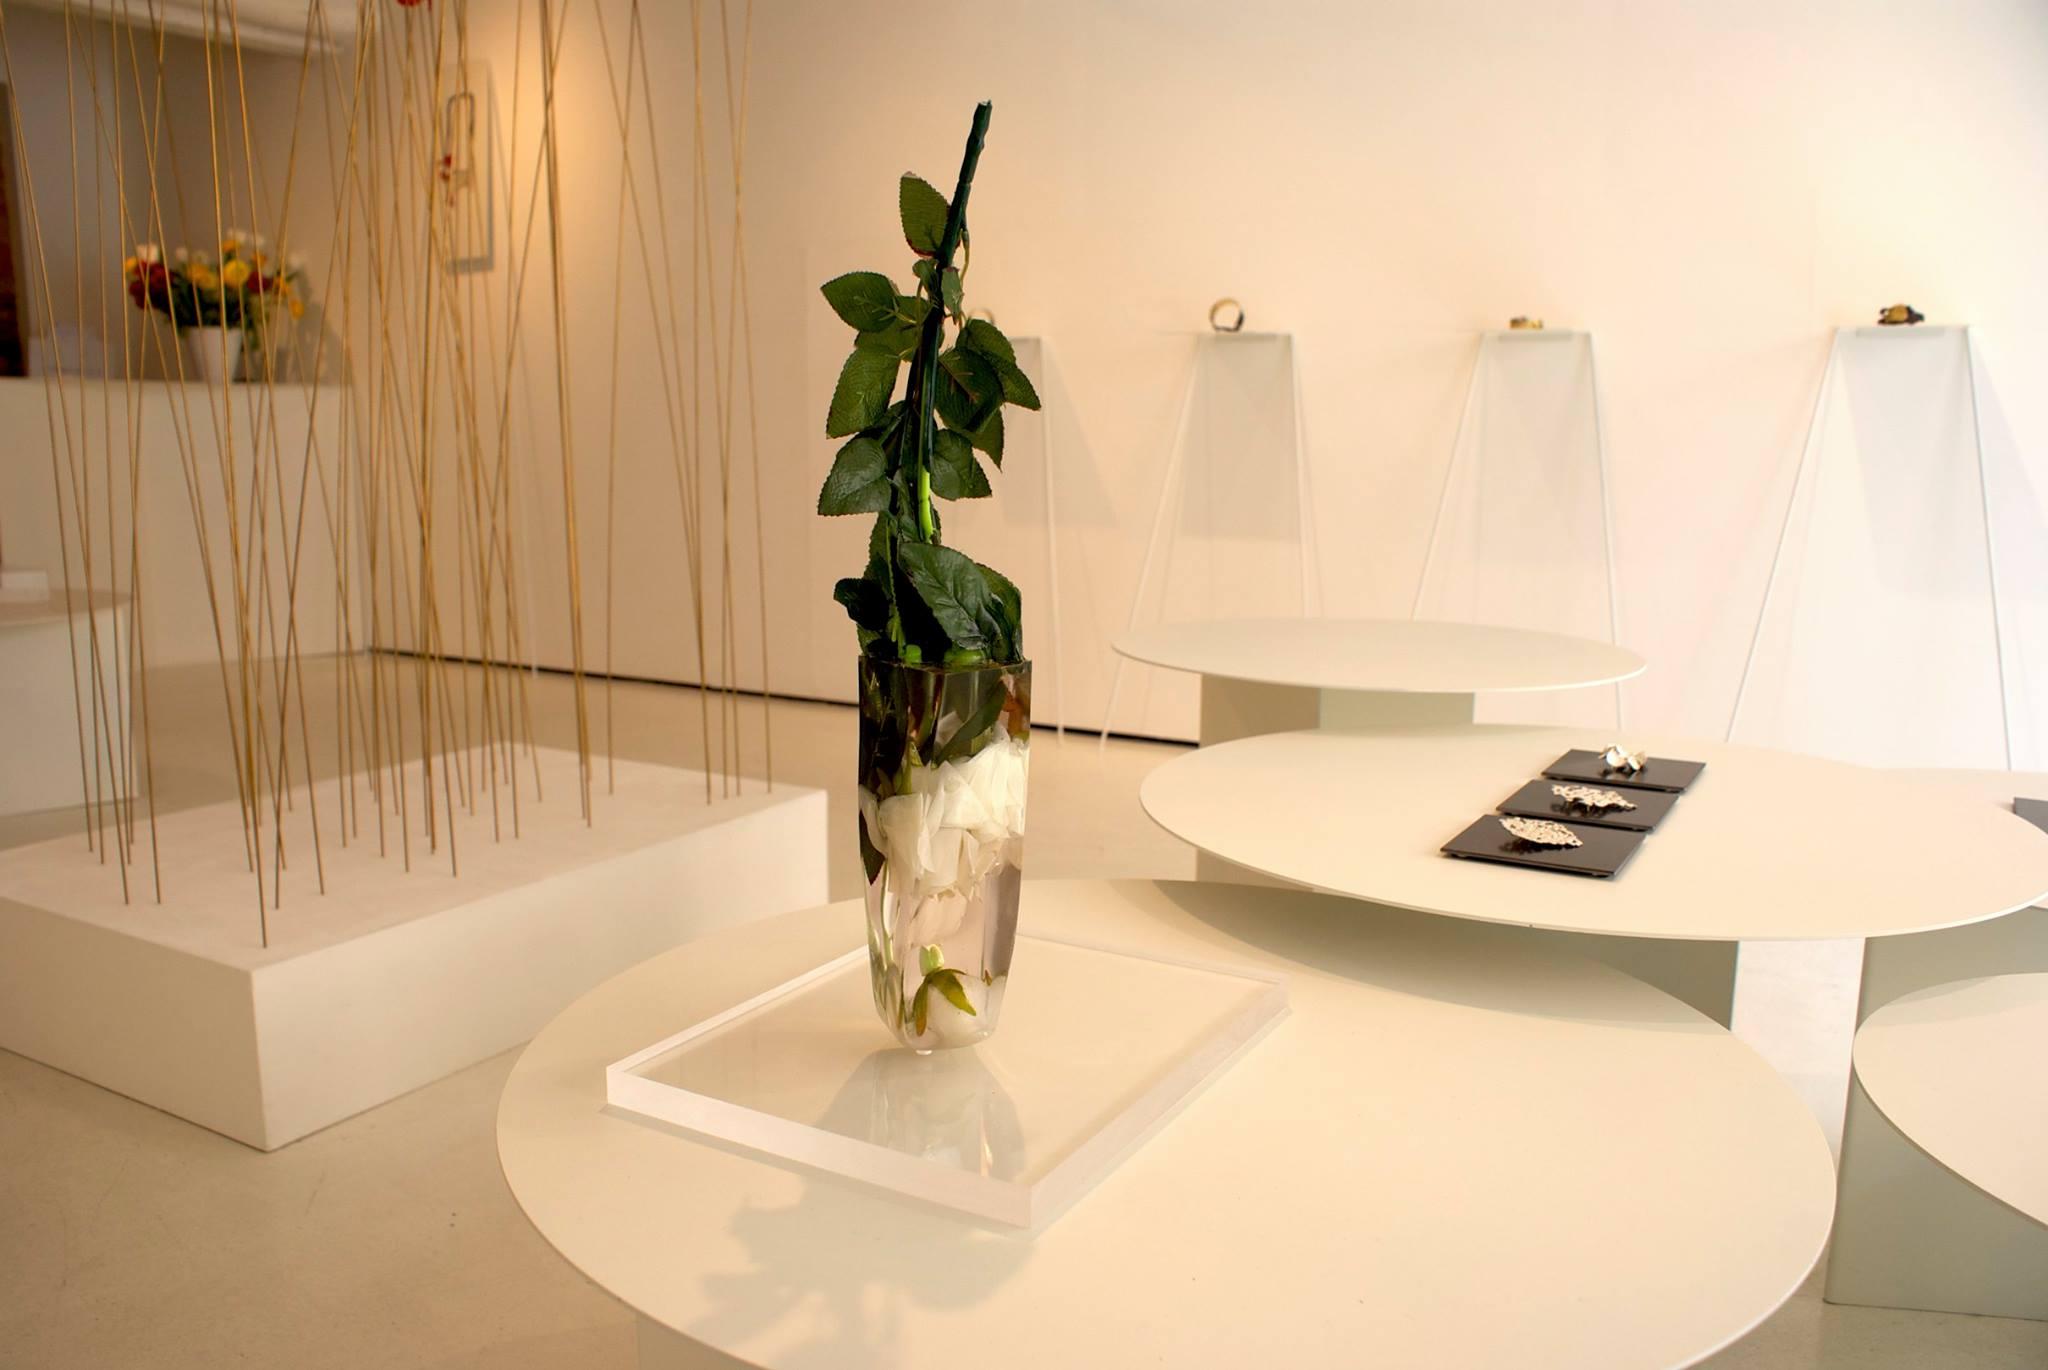 exhibition view,  Per Domani , Catalina Brenes, 2014, OHMYBLUE, Venice, Italy